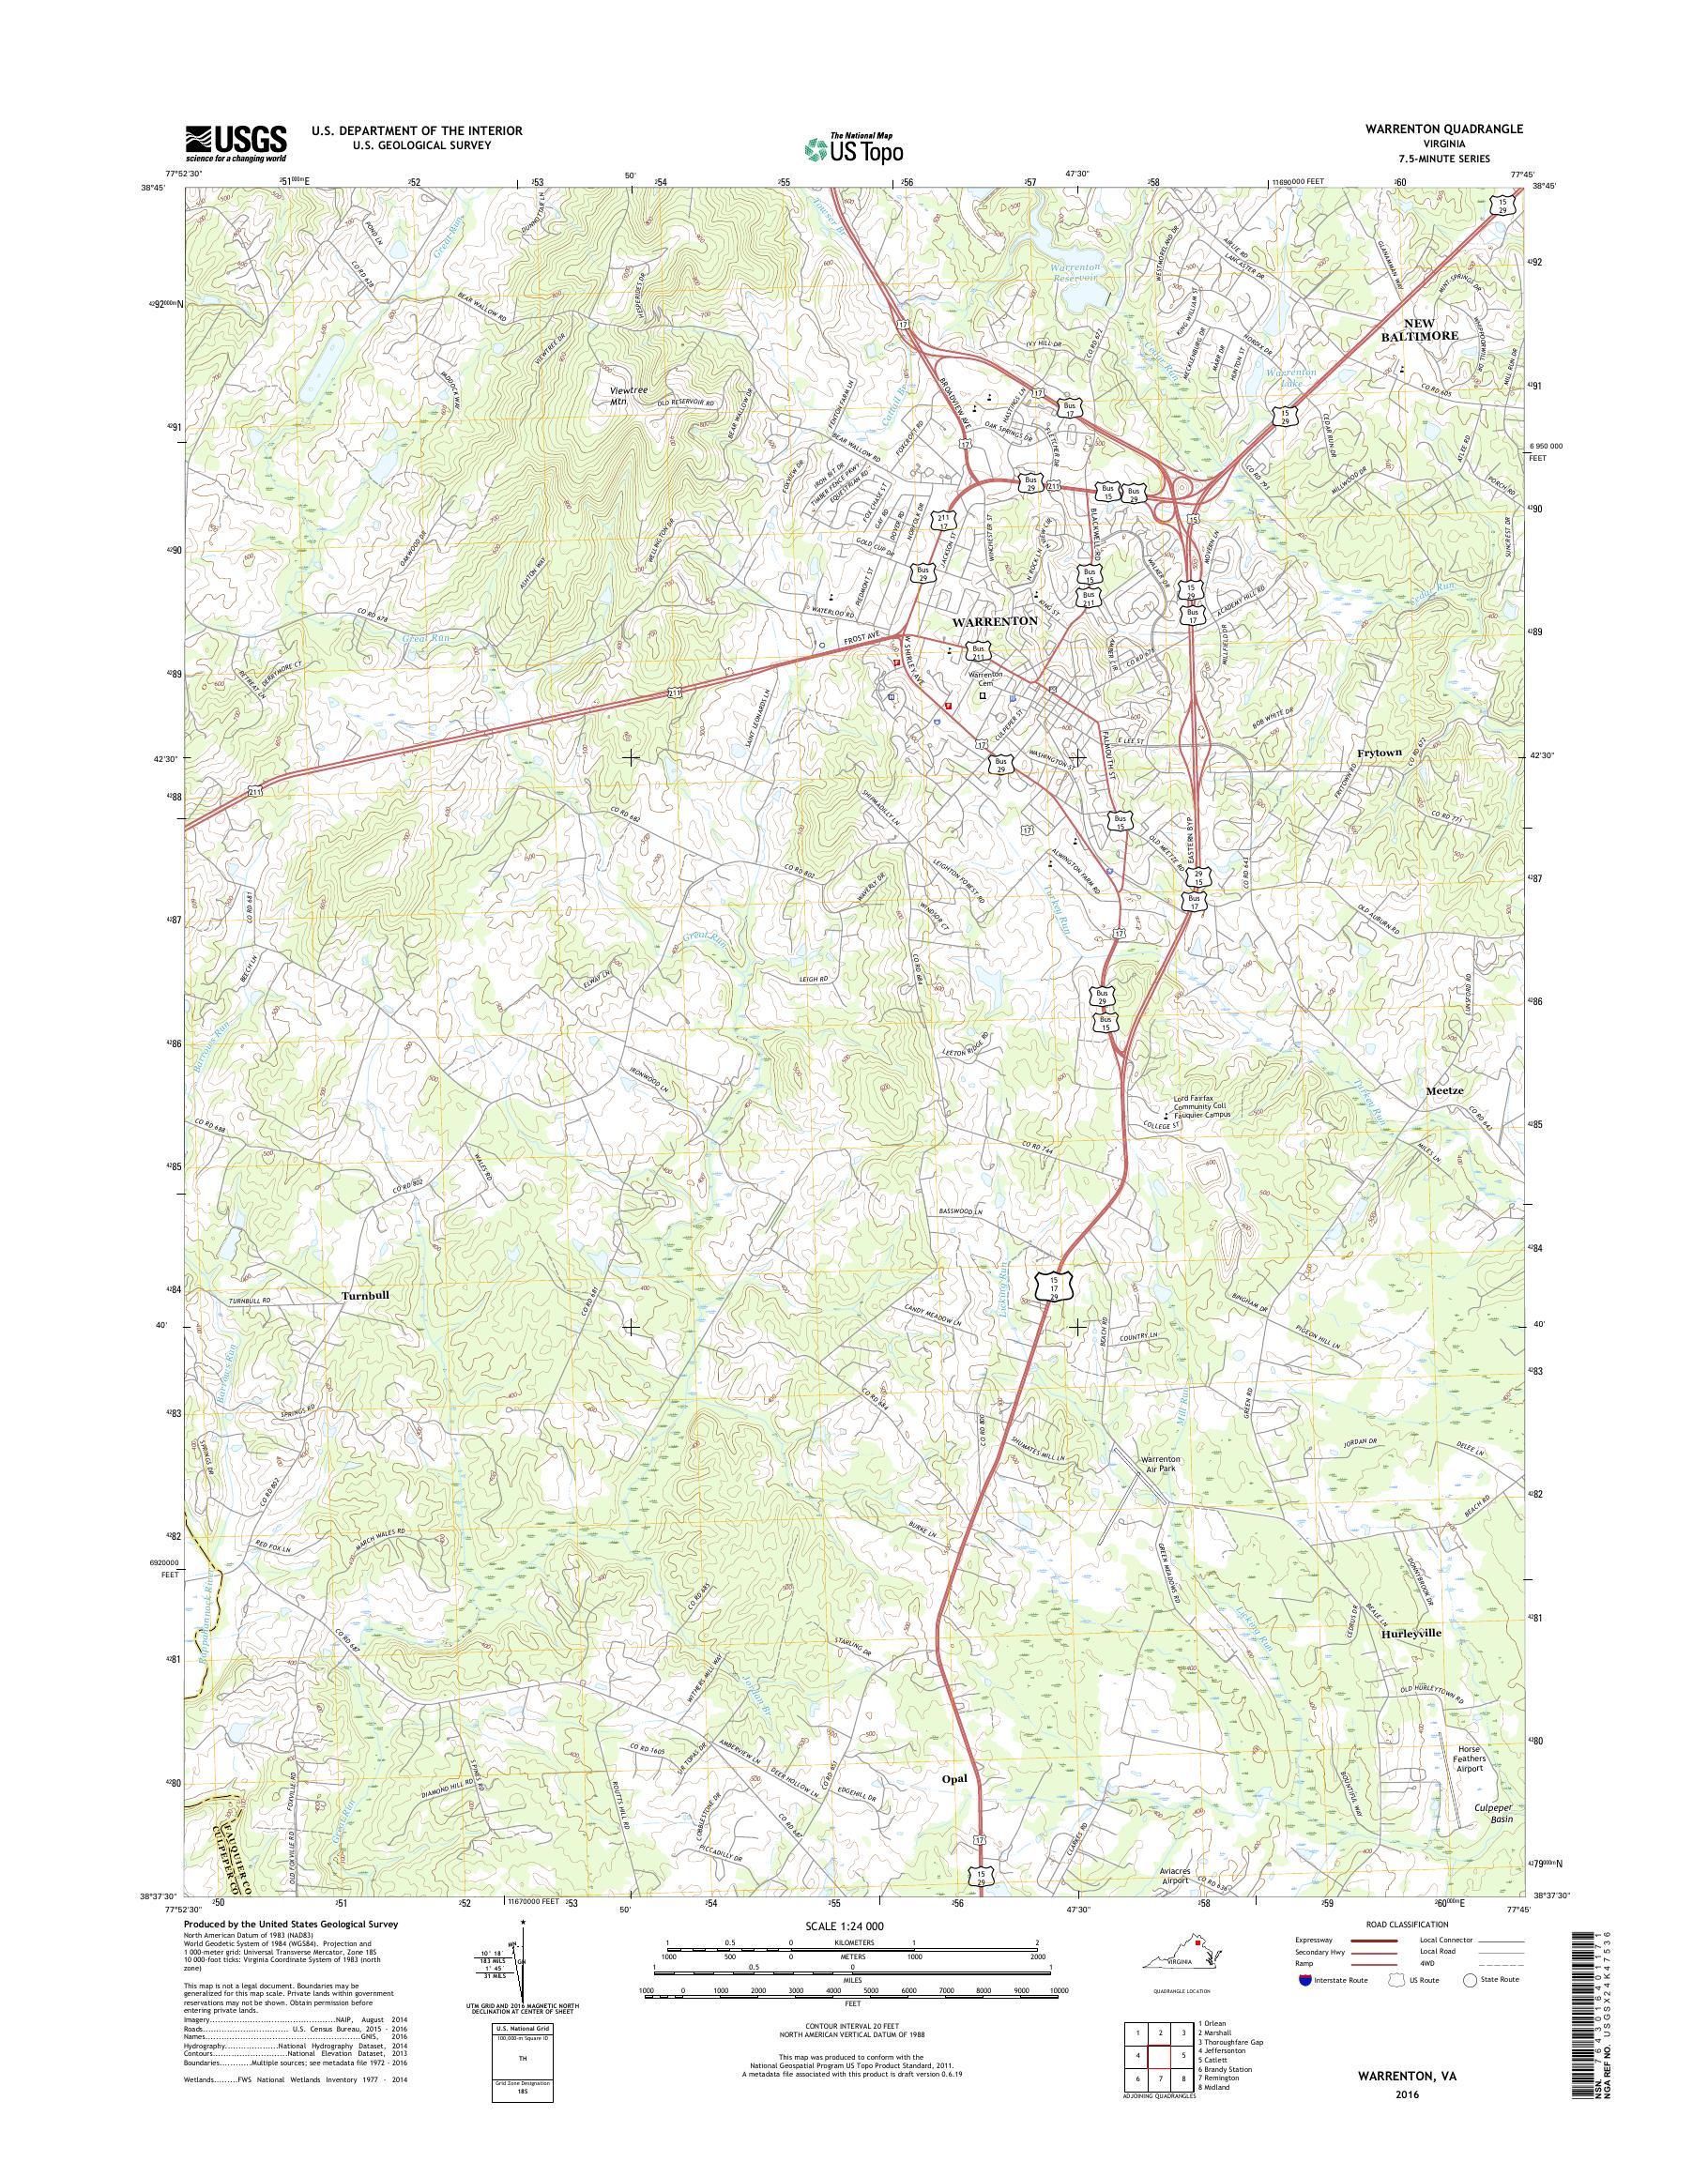 Mytopo Warrenton Virginia Usgs Quad Topo Map